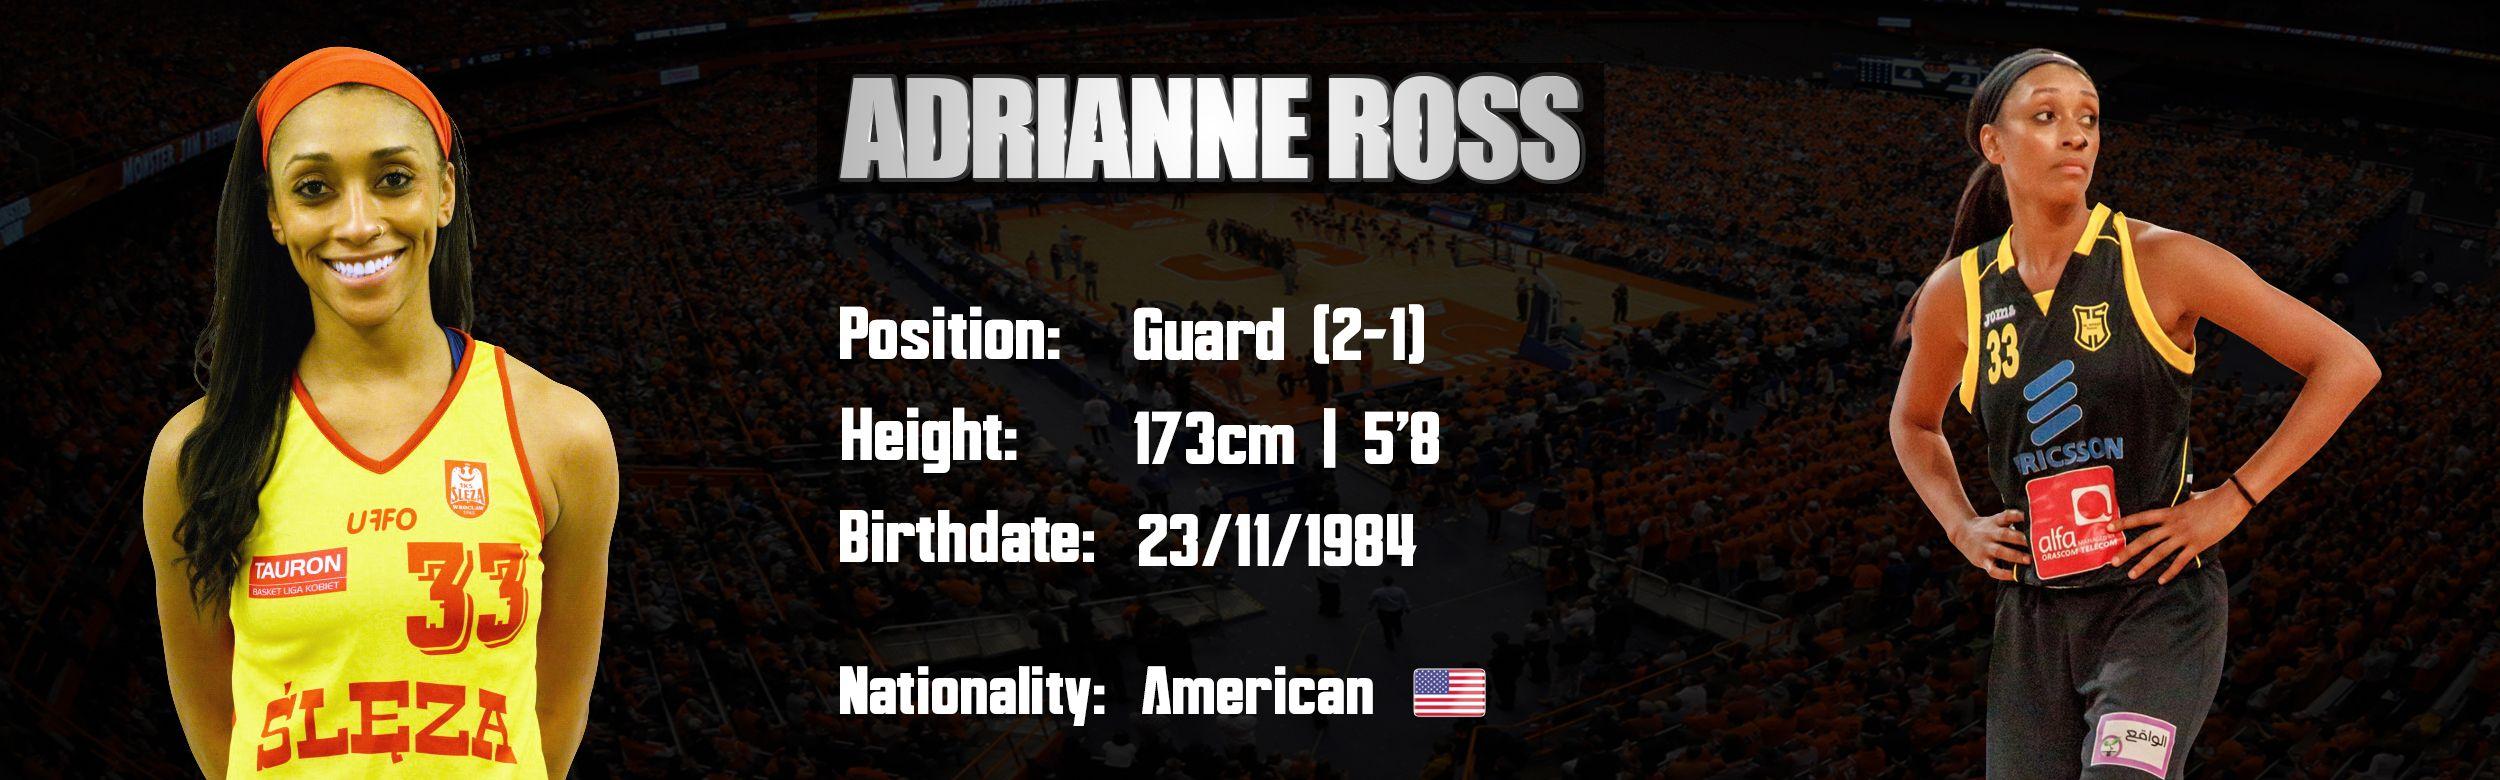 Adrianne Ross